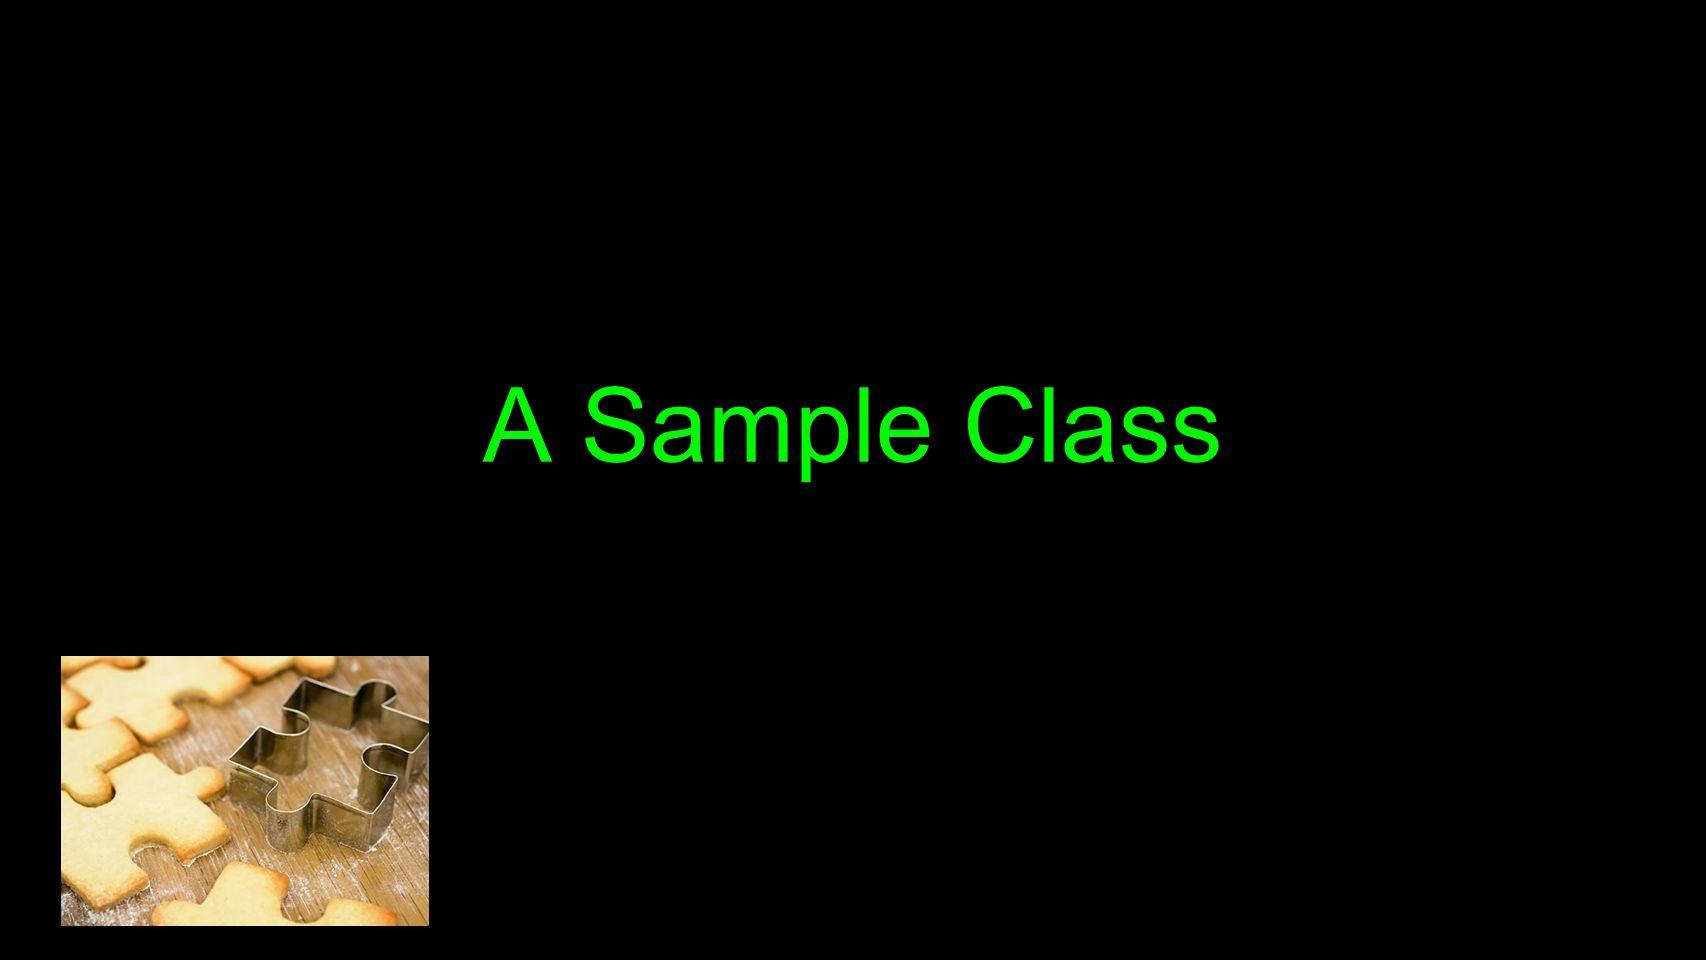 A Sample Class